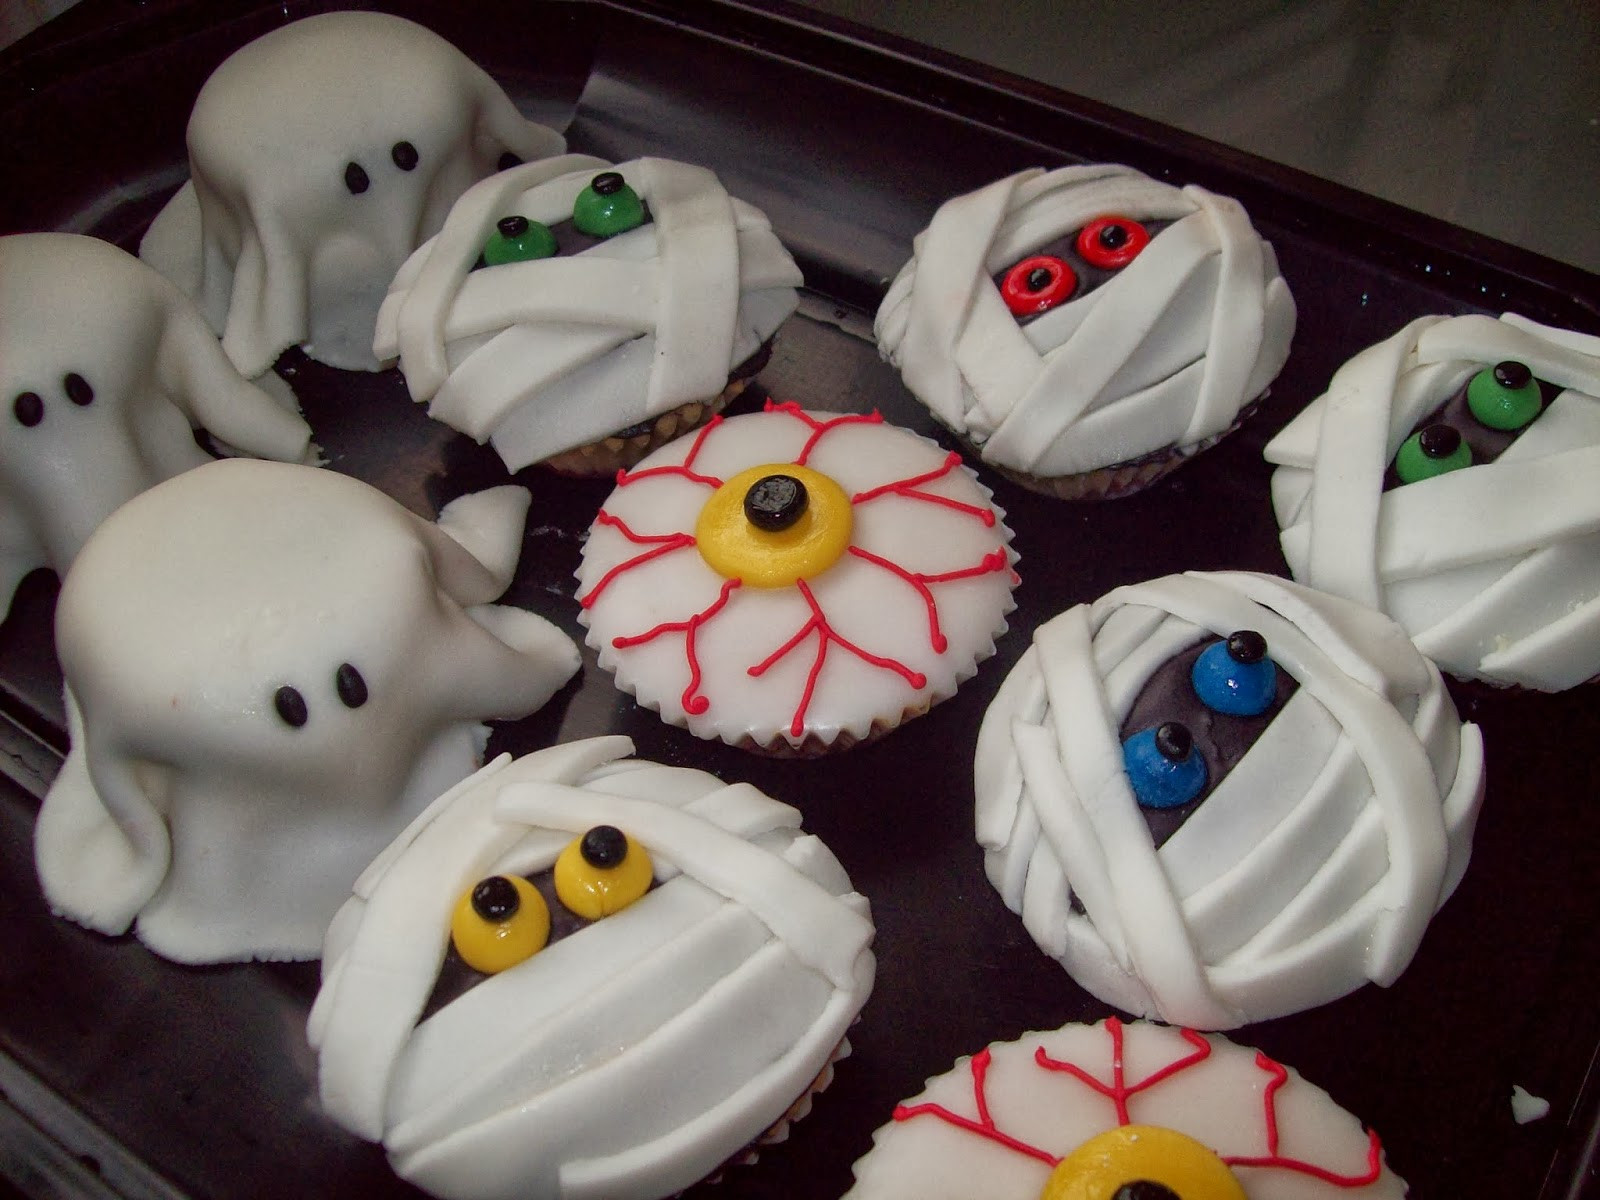 Halloween Cupcakes Images  Healthiana Spooky Halloween Cupcake Decorations